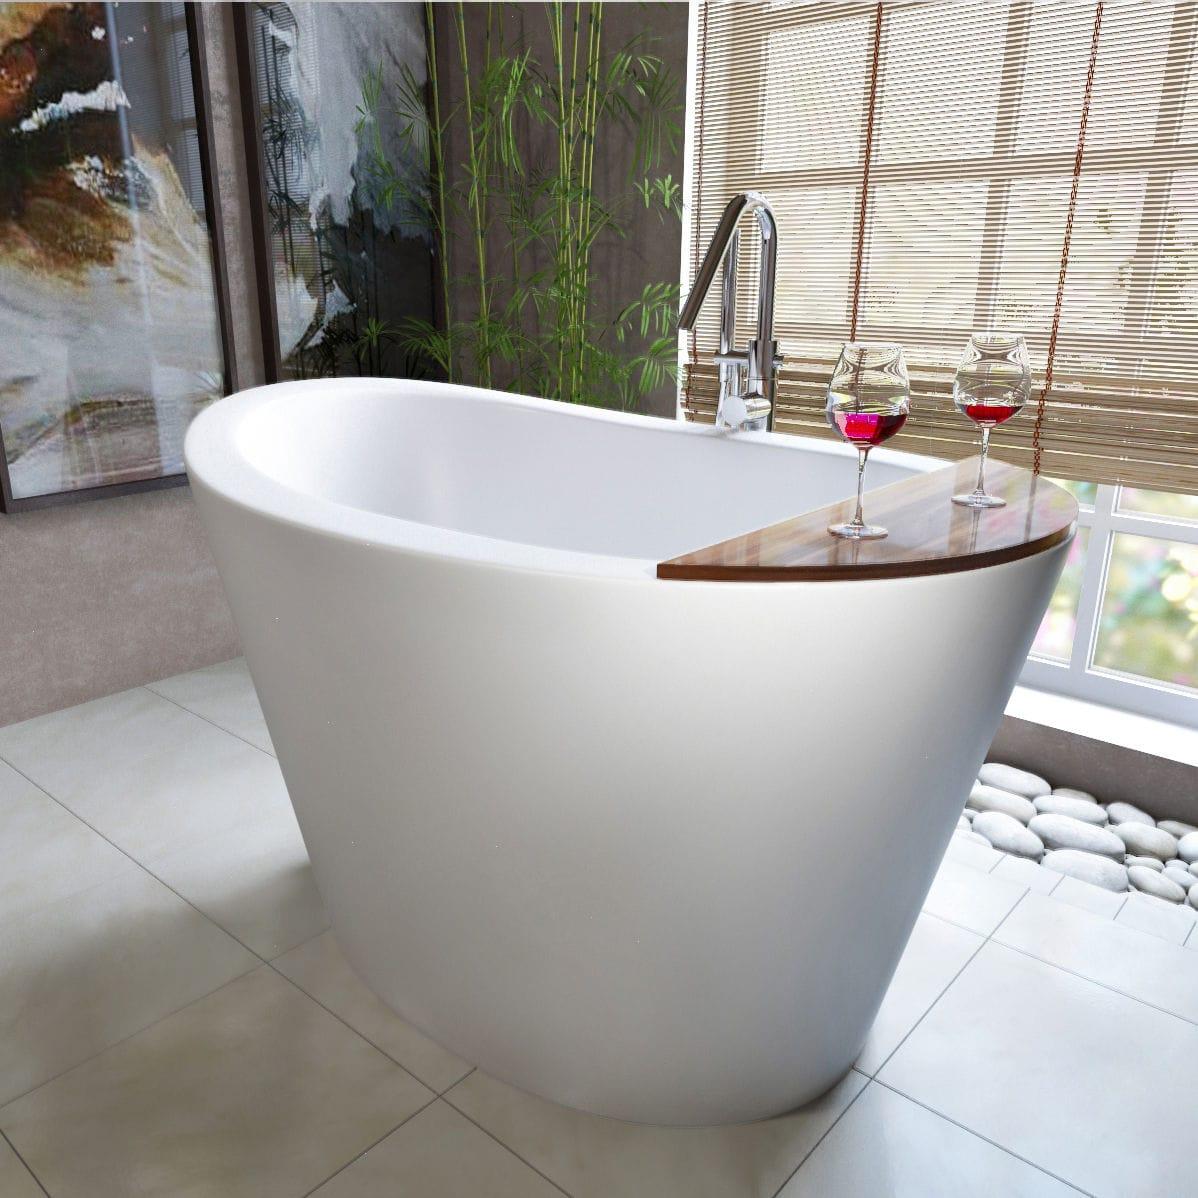 update modern old bathtubs tub take on bathroom freestanding an concept bathtub stone a